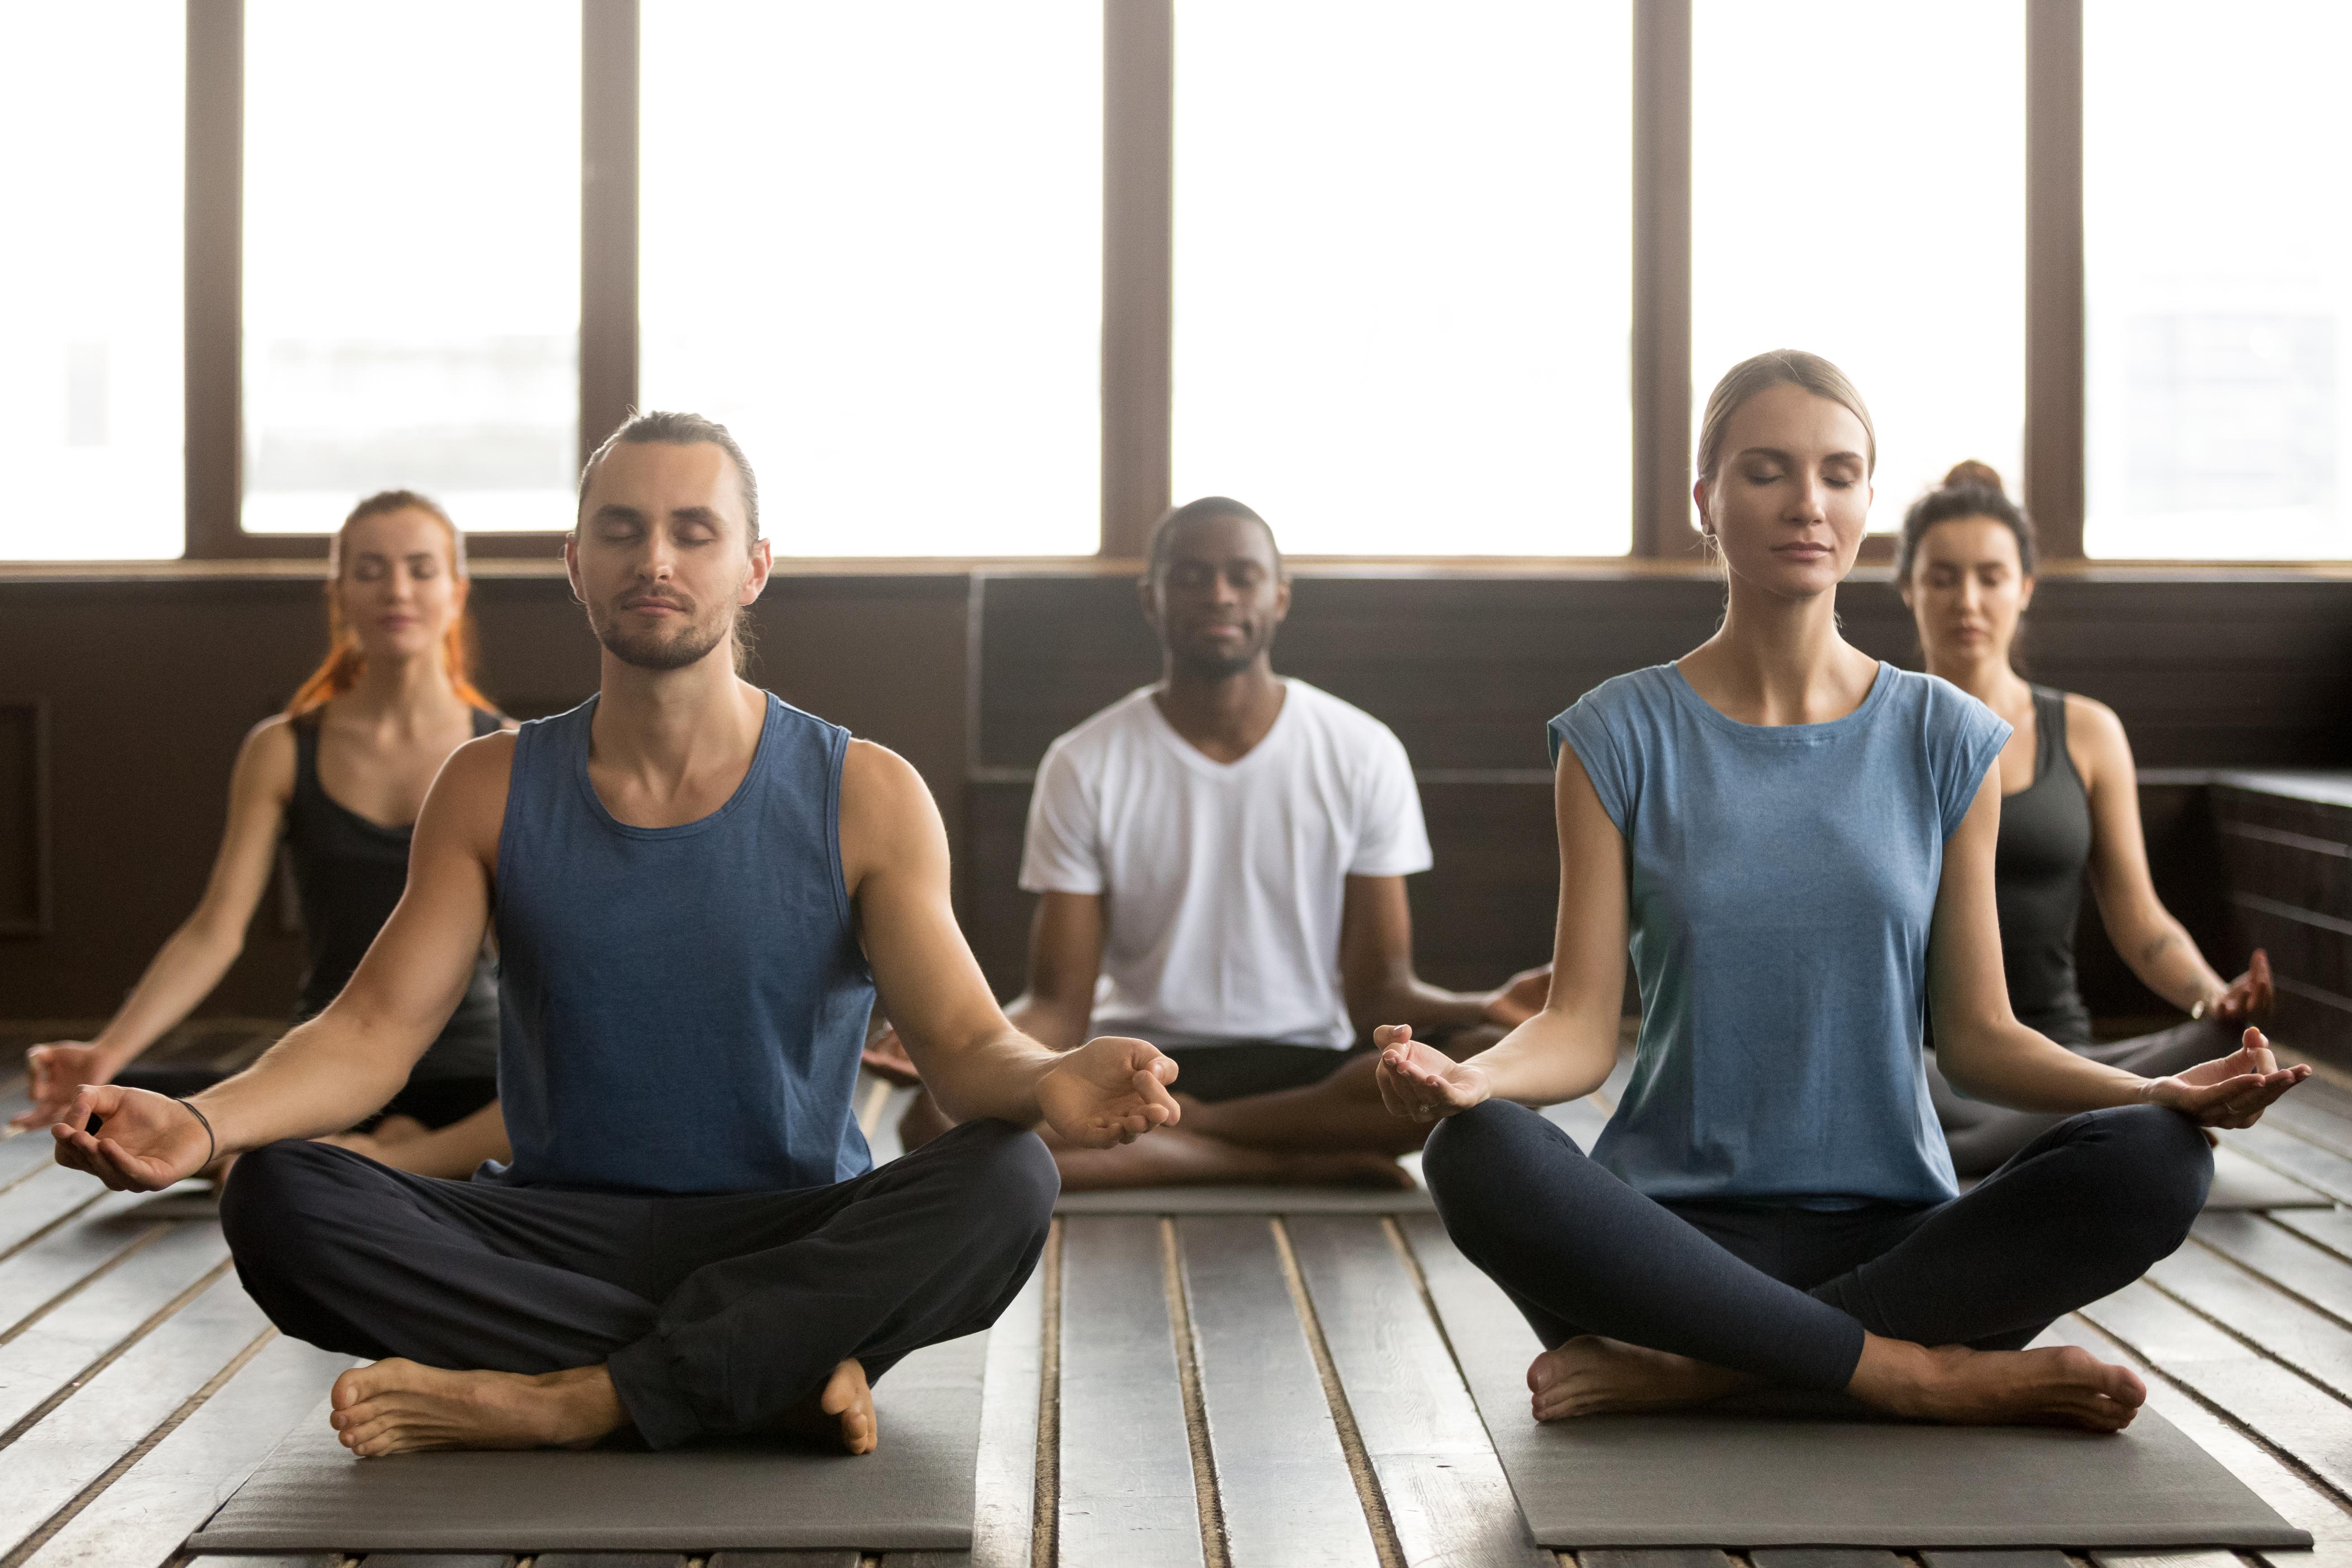 Quels sont les différents types de yoga?